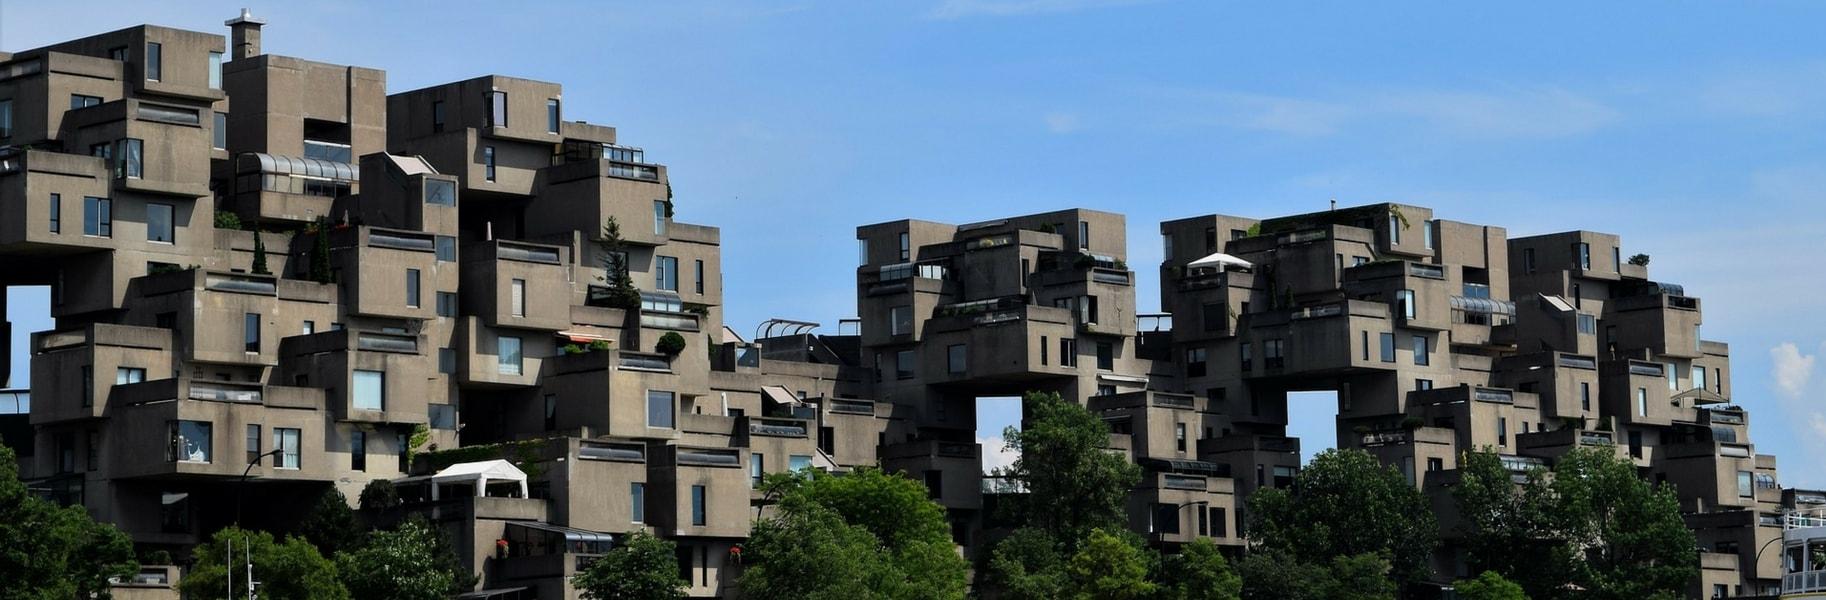 Condos Montréal hypothèque